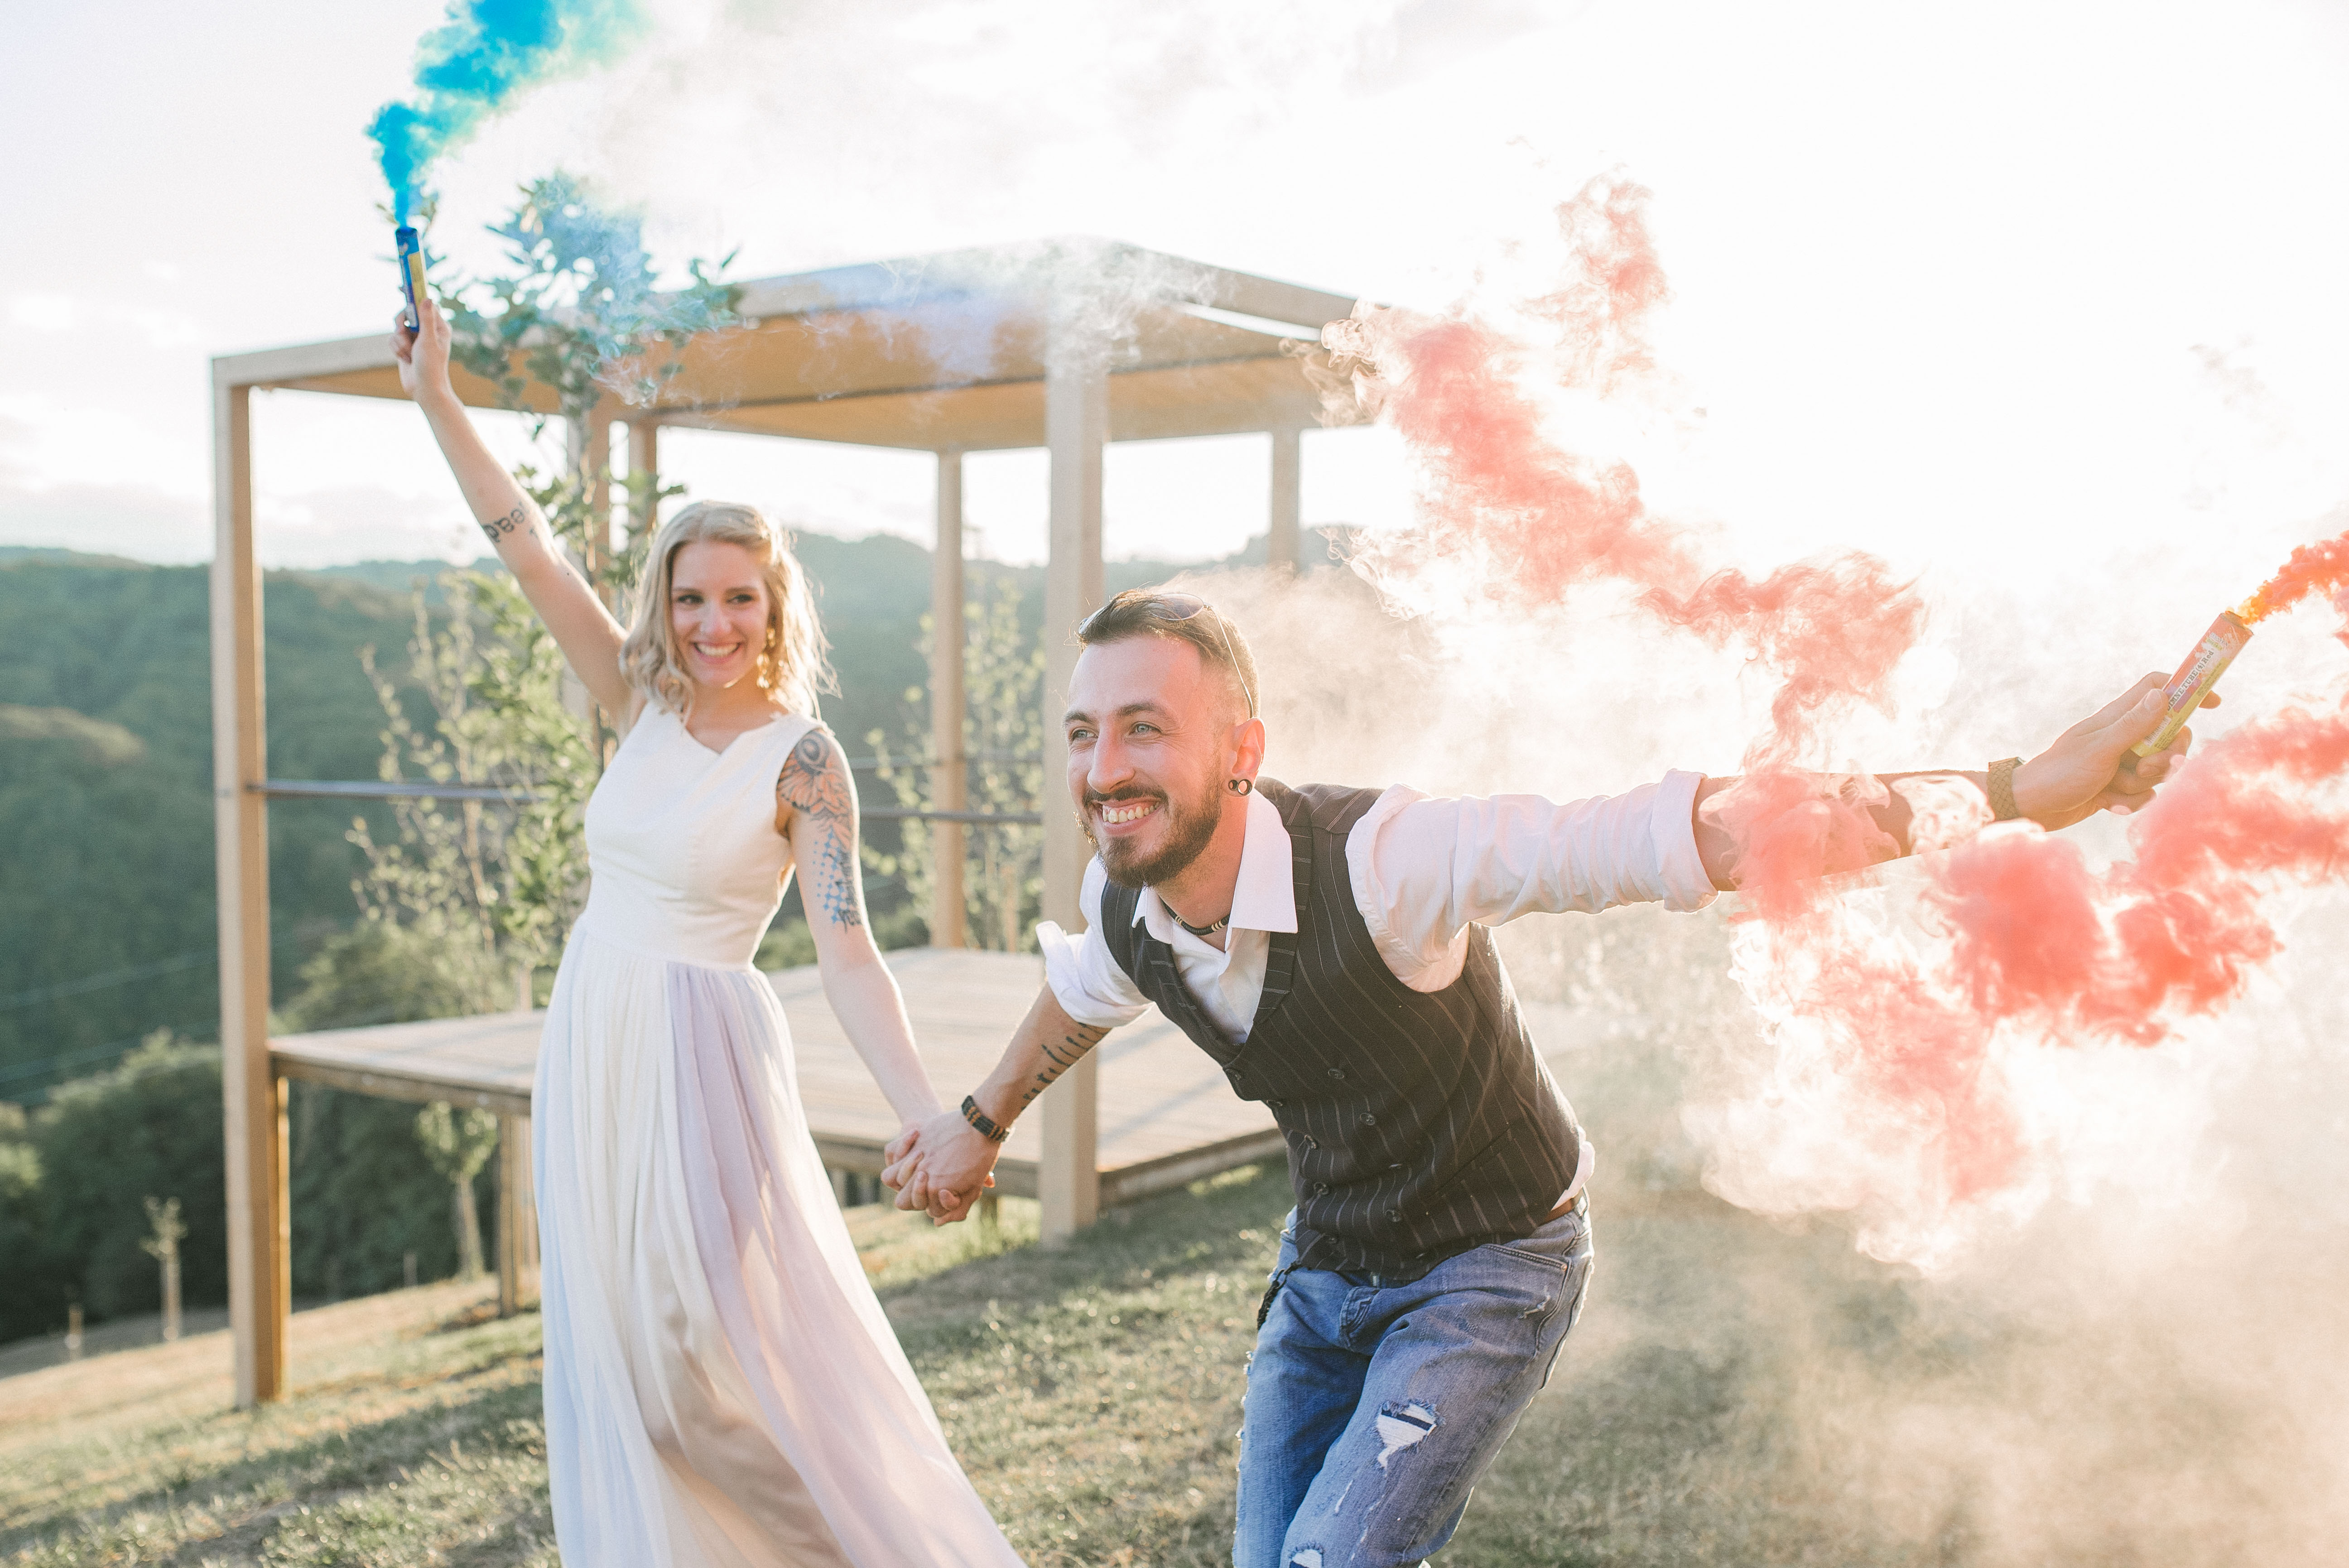 Hipster Wedding | Neža Reisner - Wedding Photographer